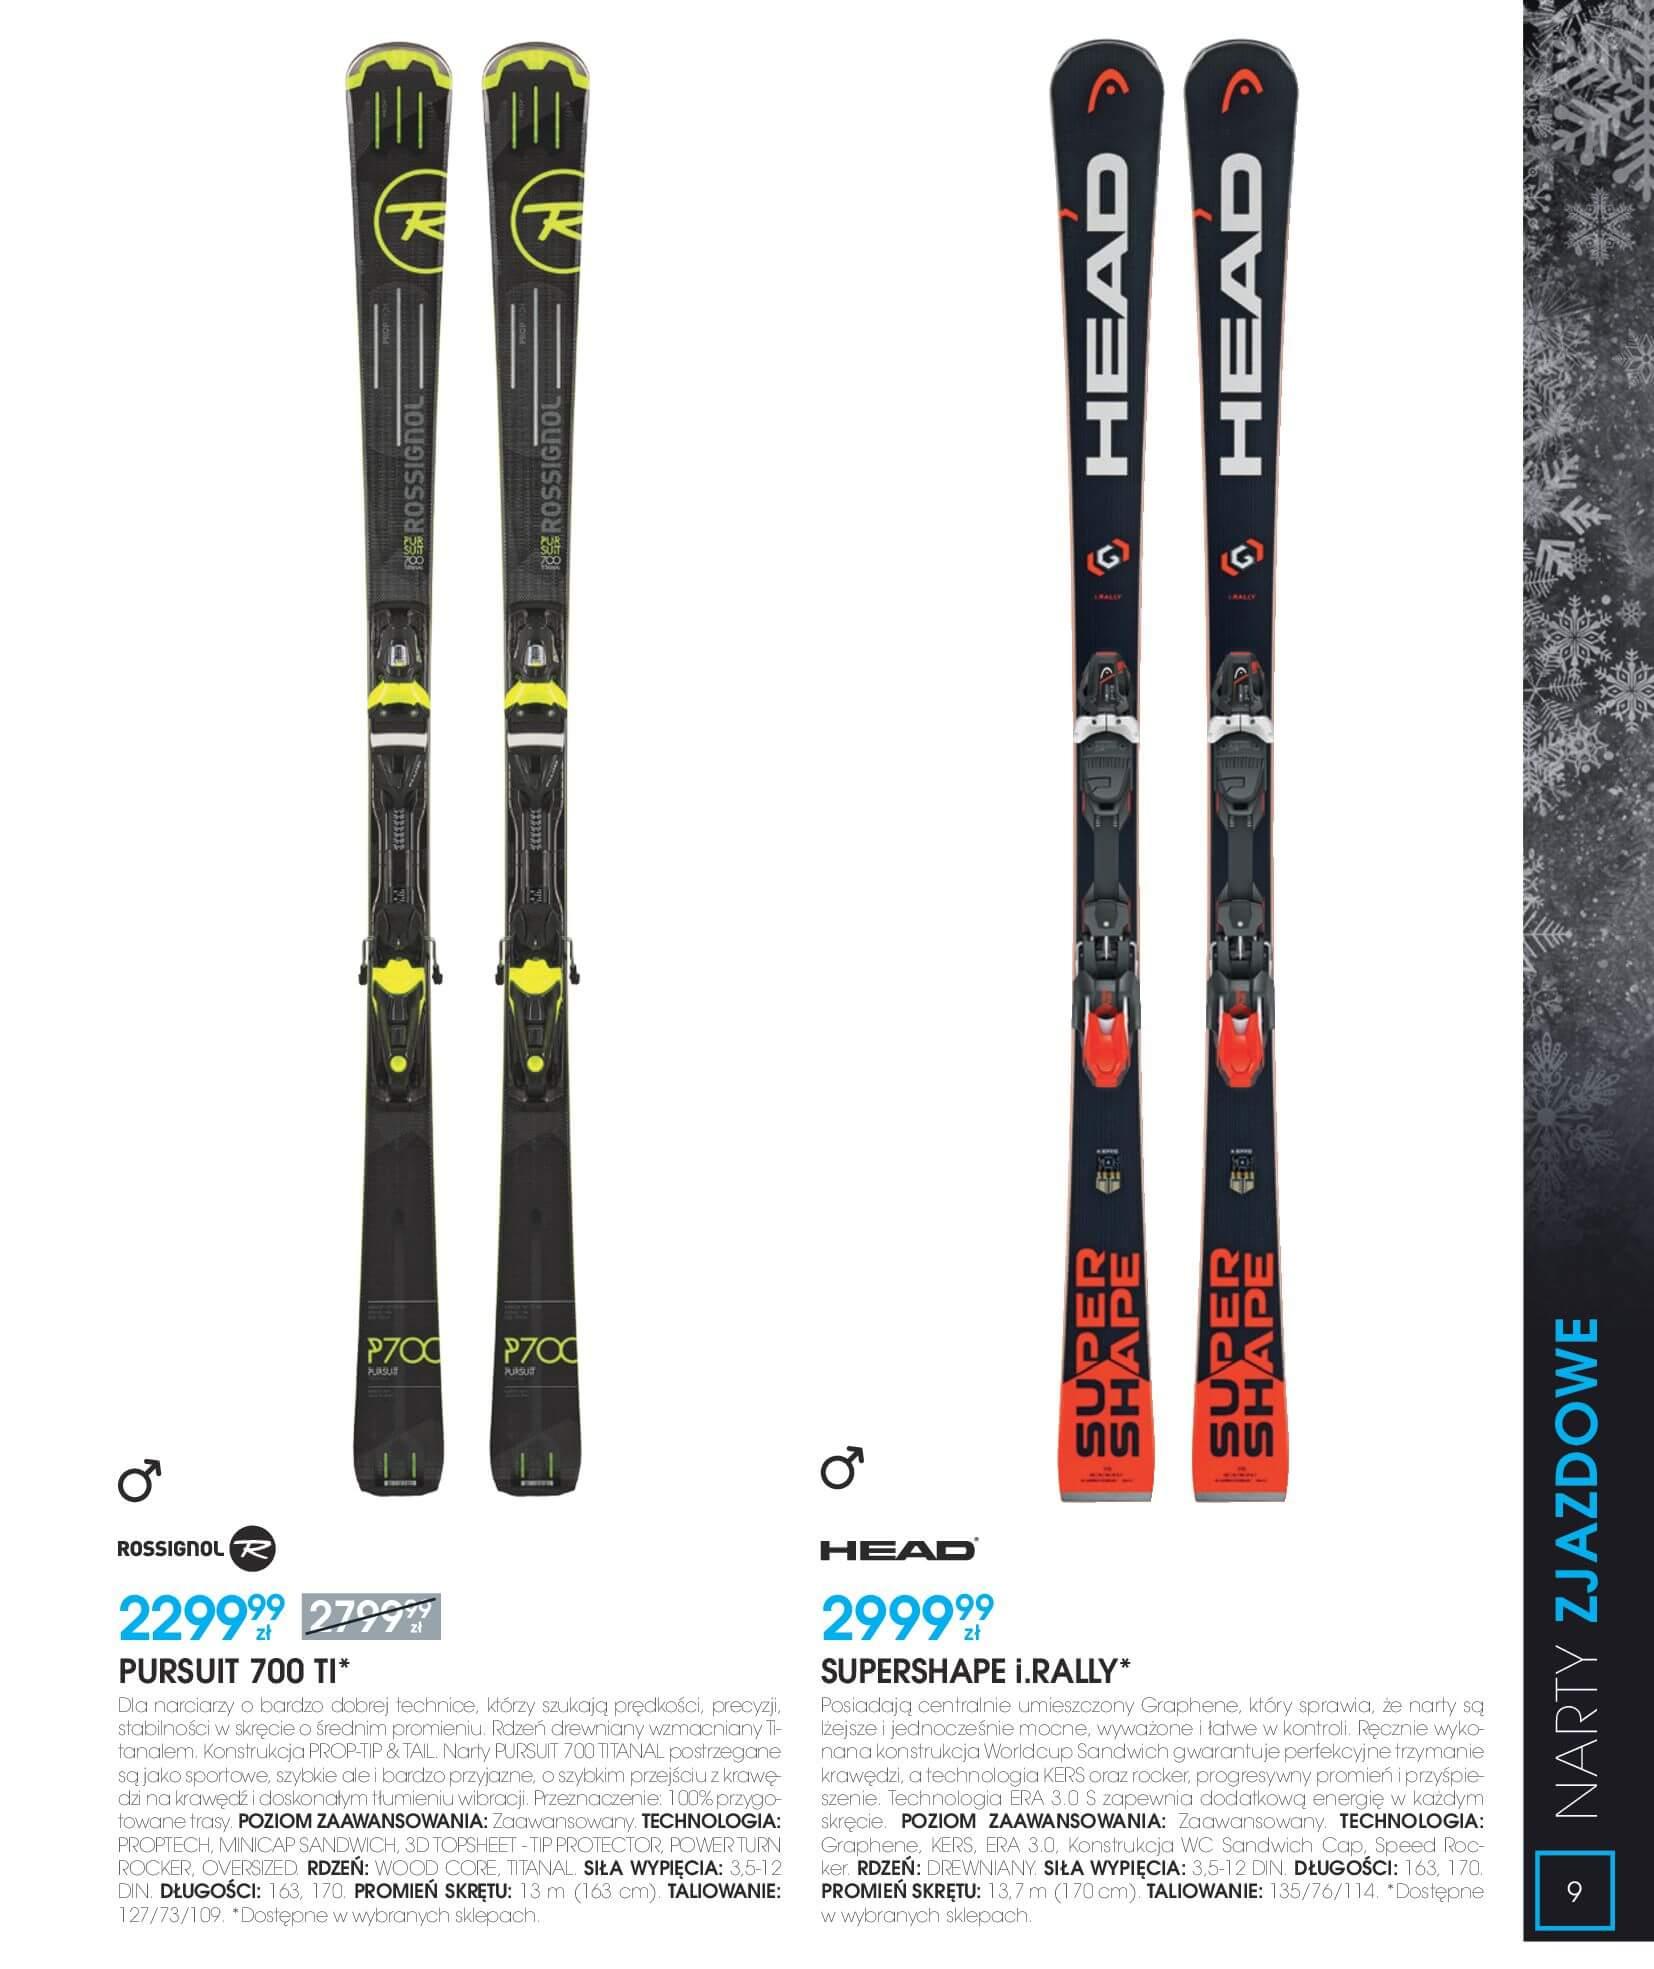 Gazetka Go Sport - Katalog Zima 2017/2018-12.11.2017-28.02.2018-page-9